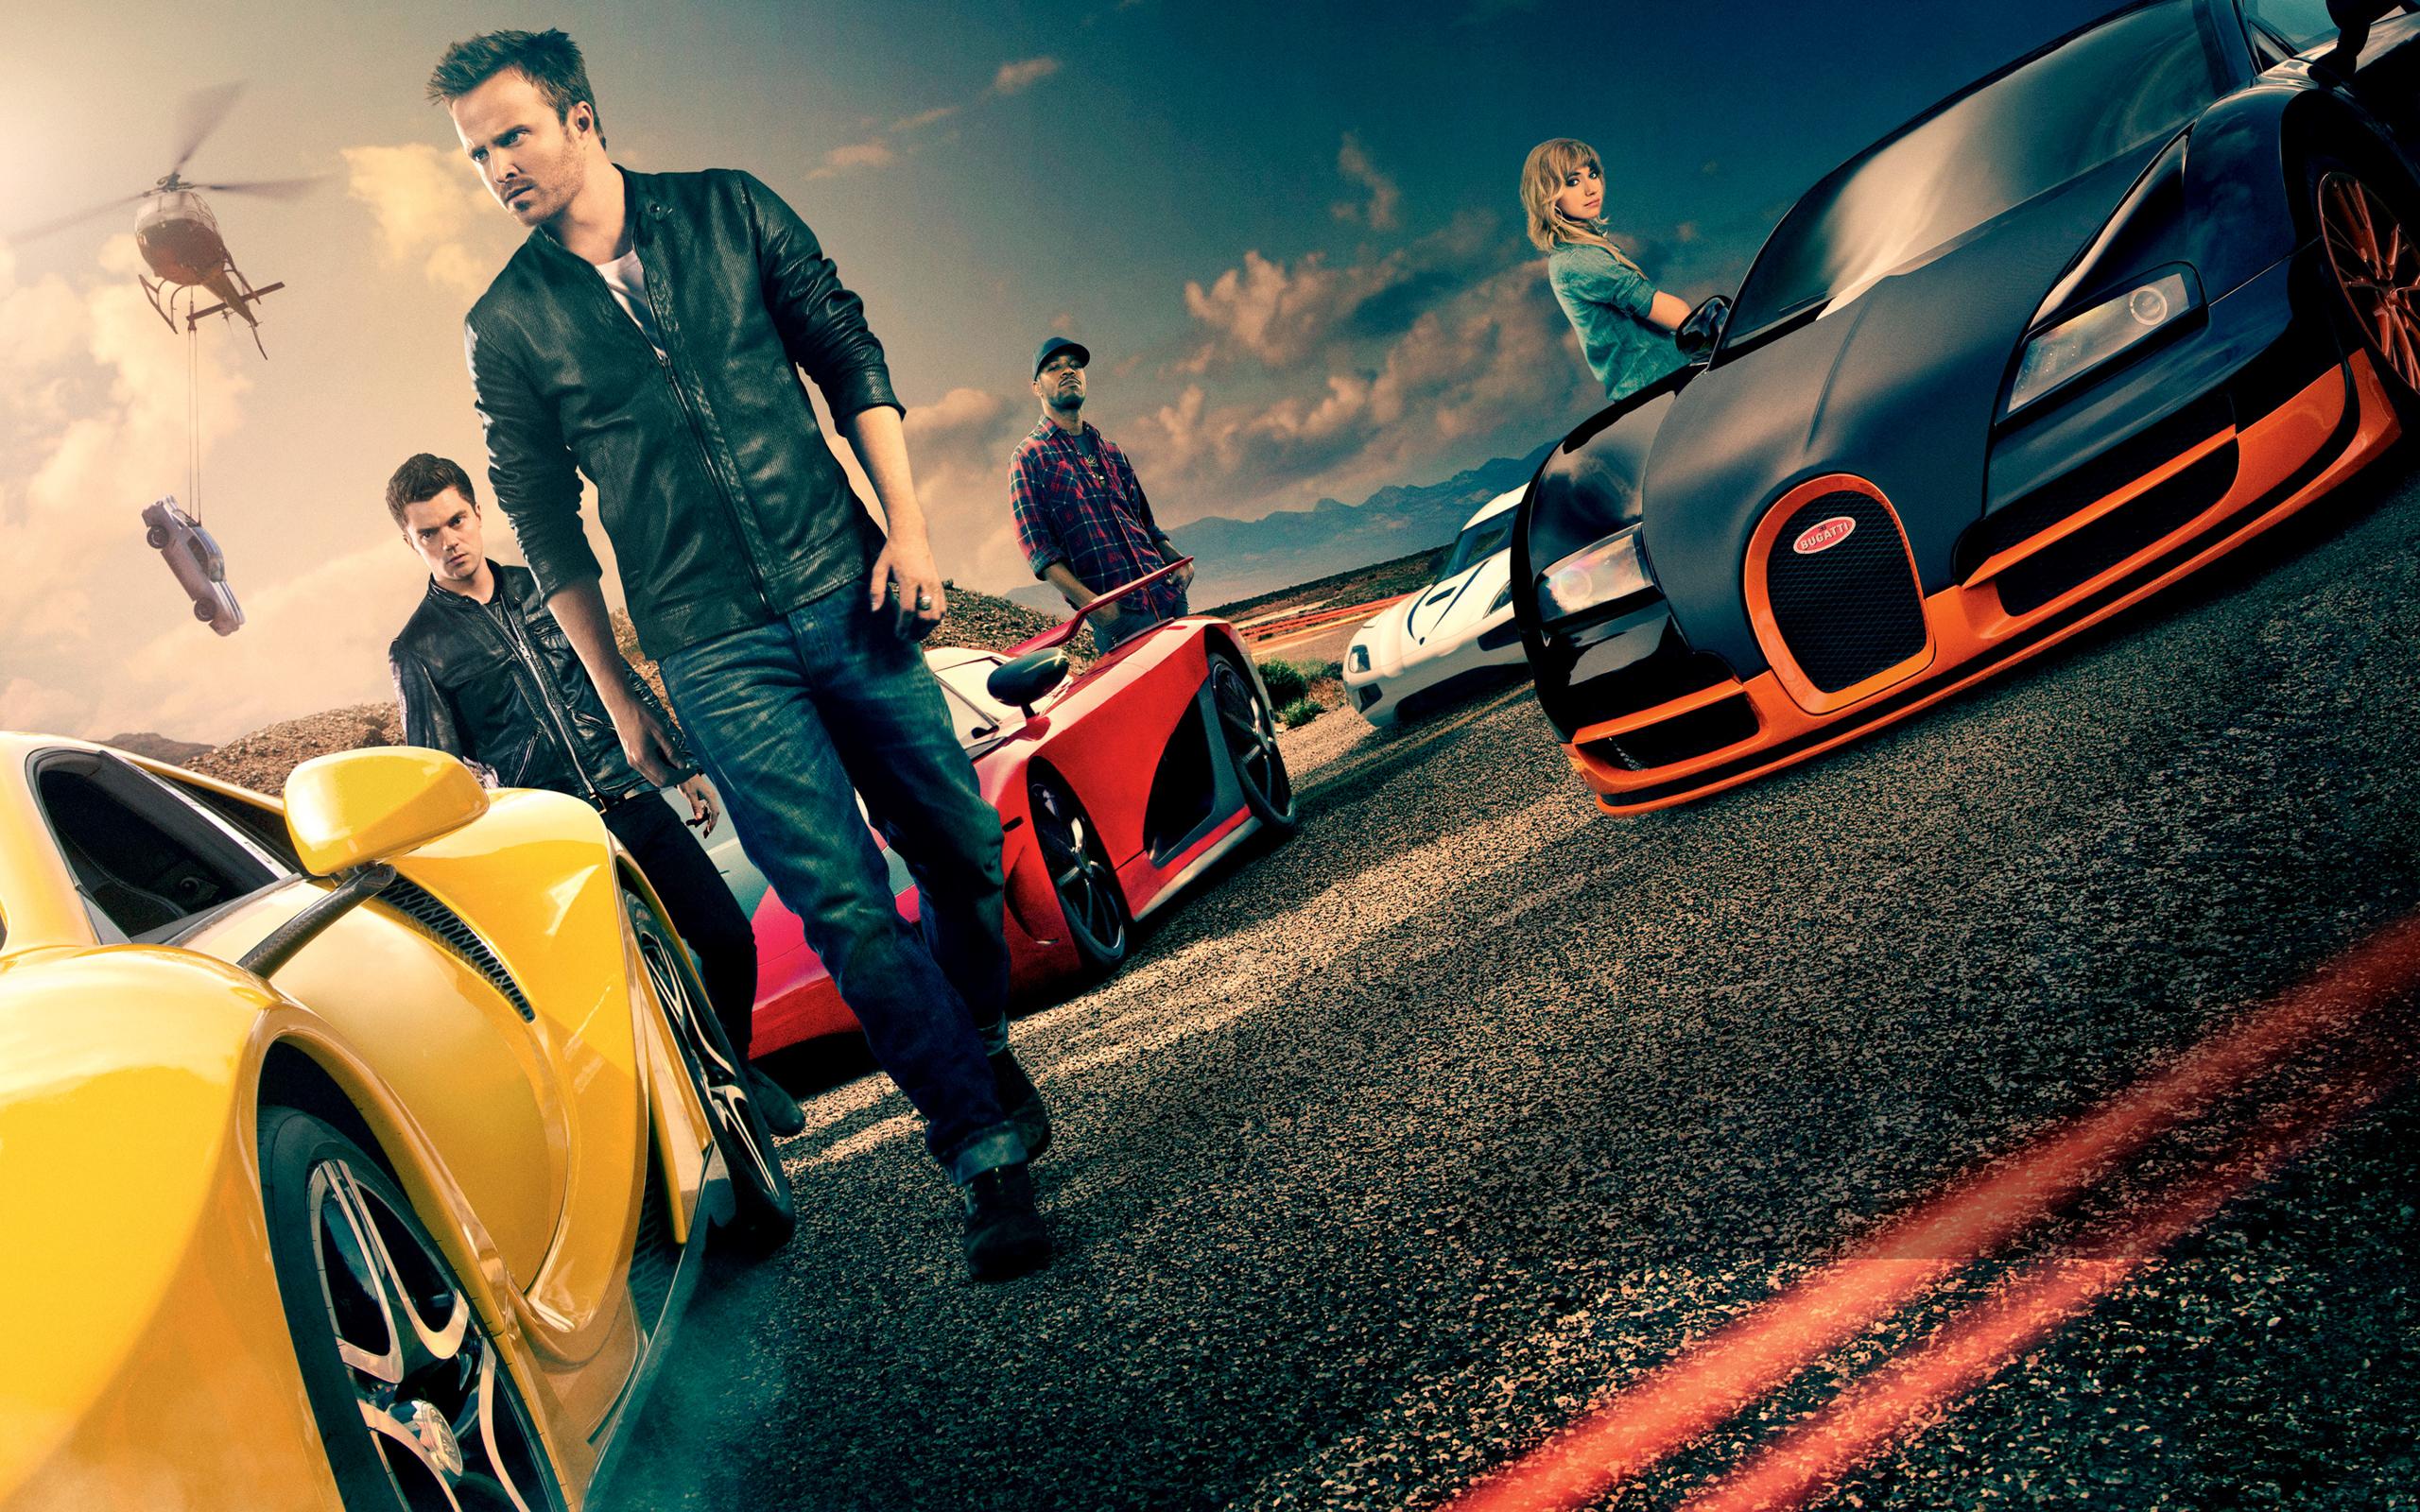 Премьера фильма need for speed жажда скорости.